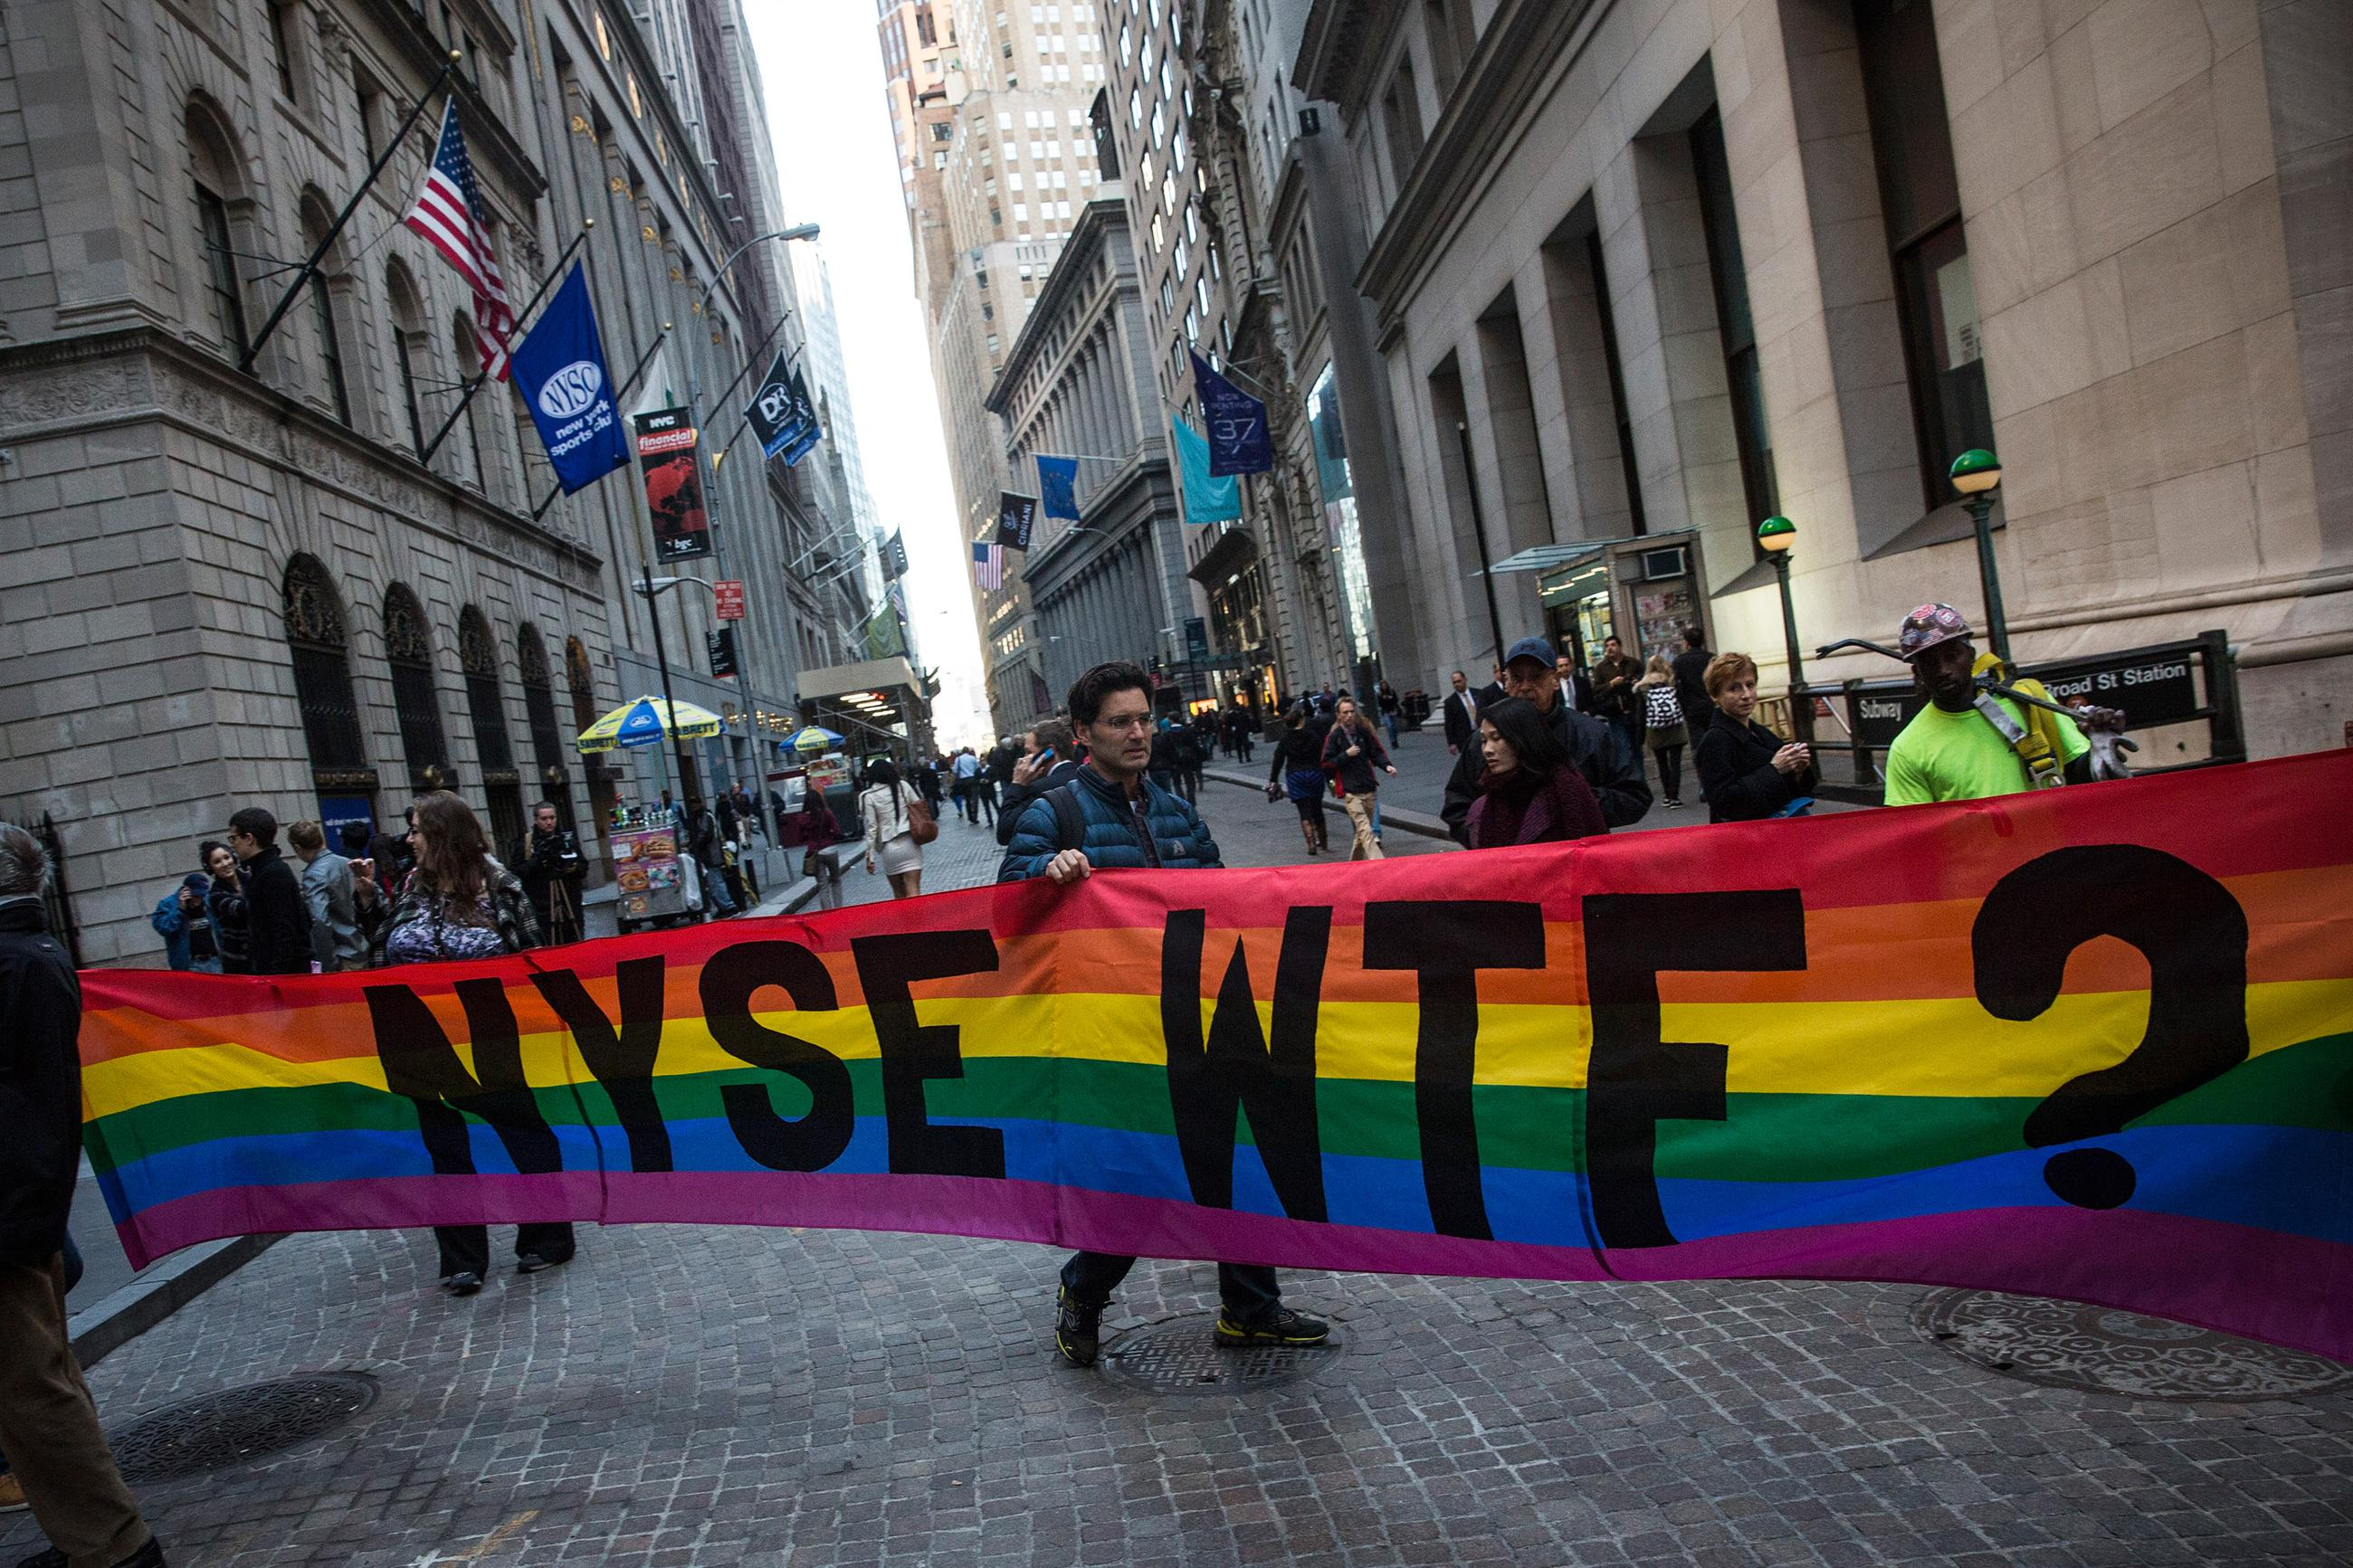 Anti gay group